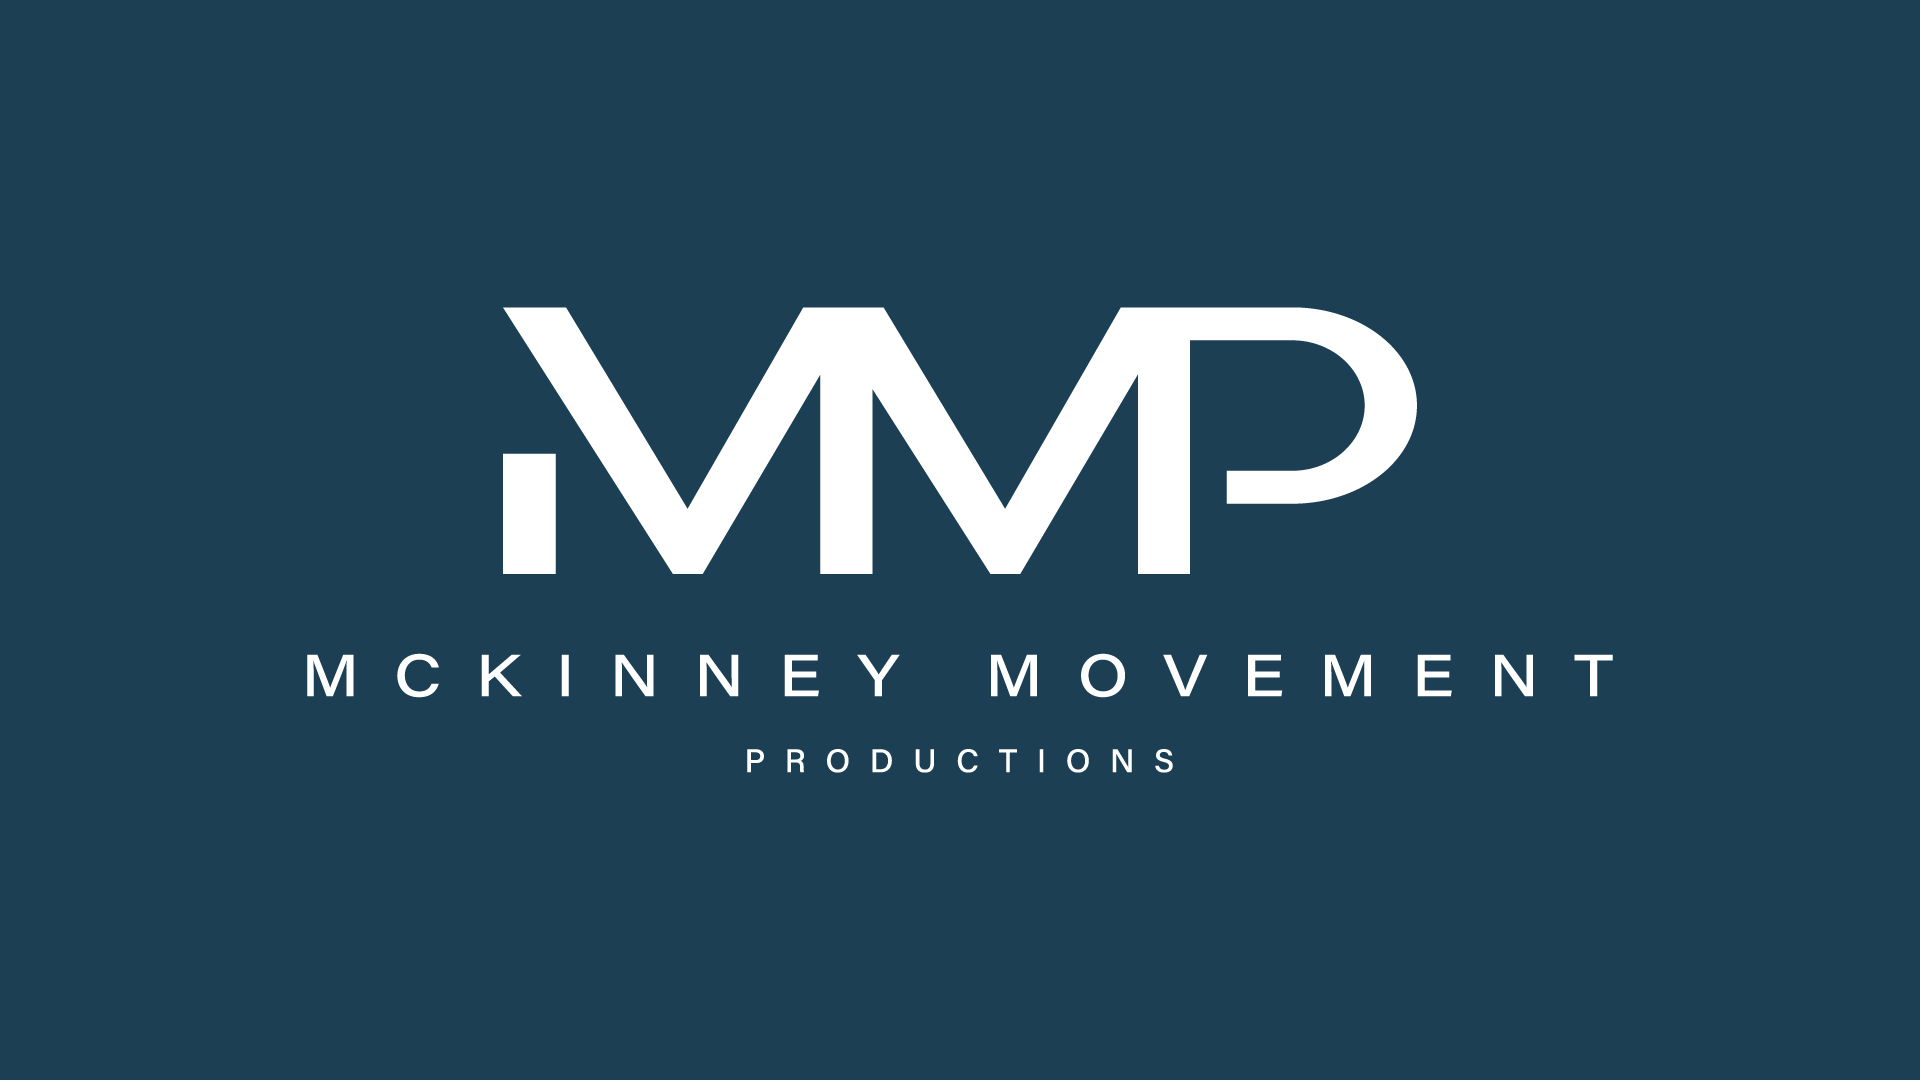 White-Mckinney-Movement-Main-Logo-RGB.jpg